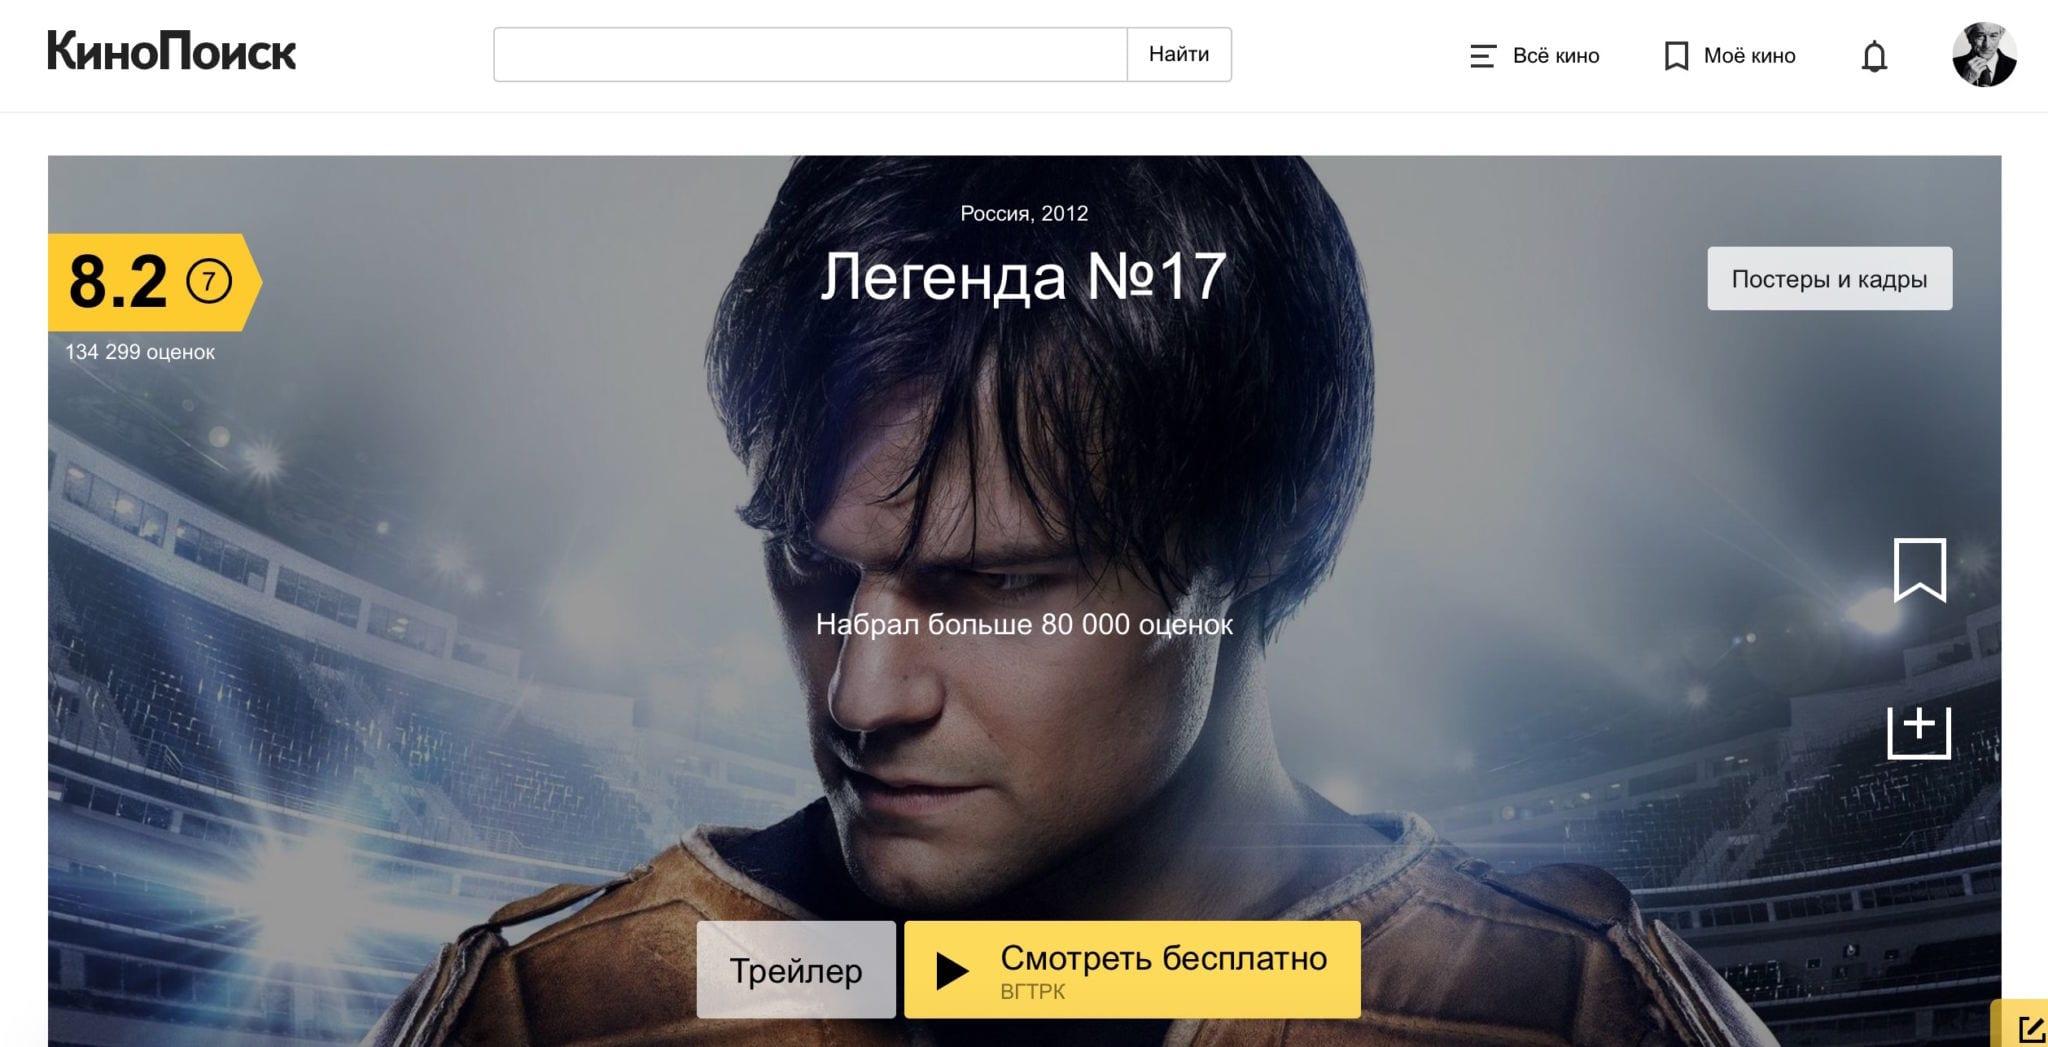 Редизайн «Кинопоиска» 2015